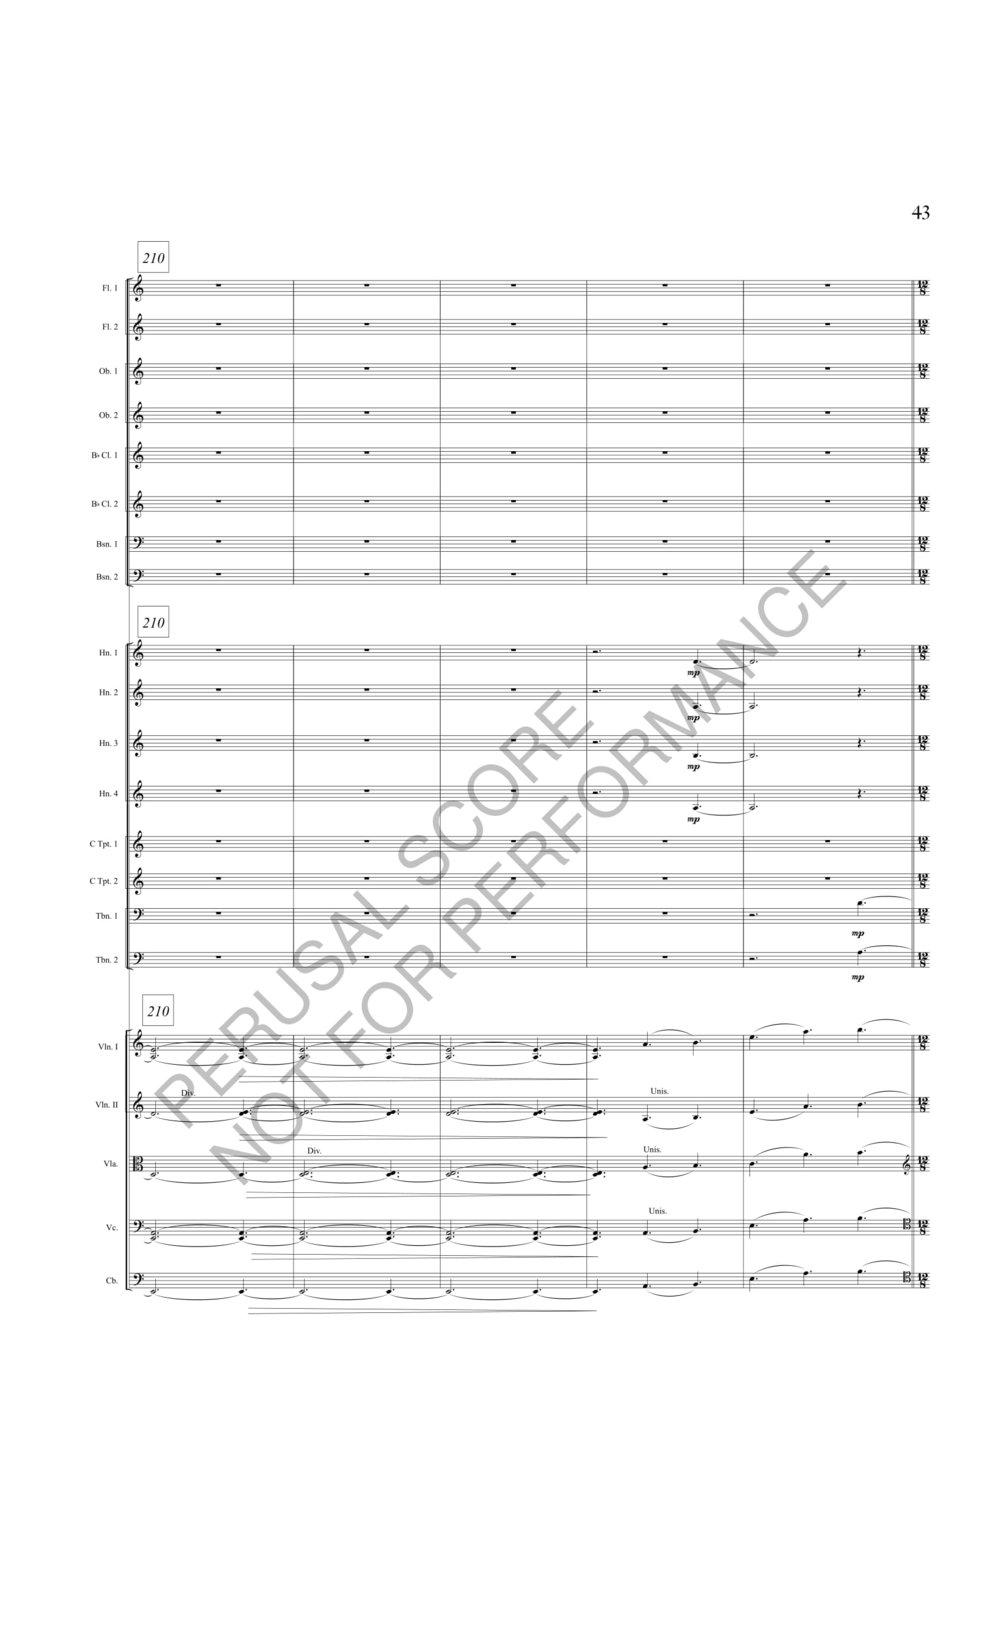 Boyd Ondine Score-watermark (3)-49.jpg